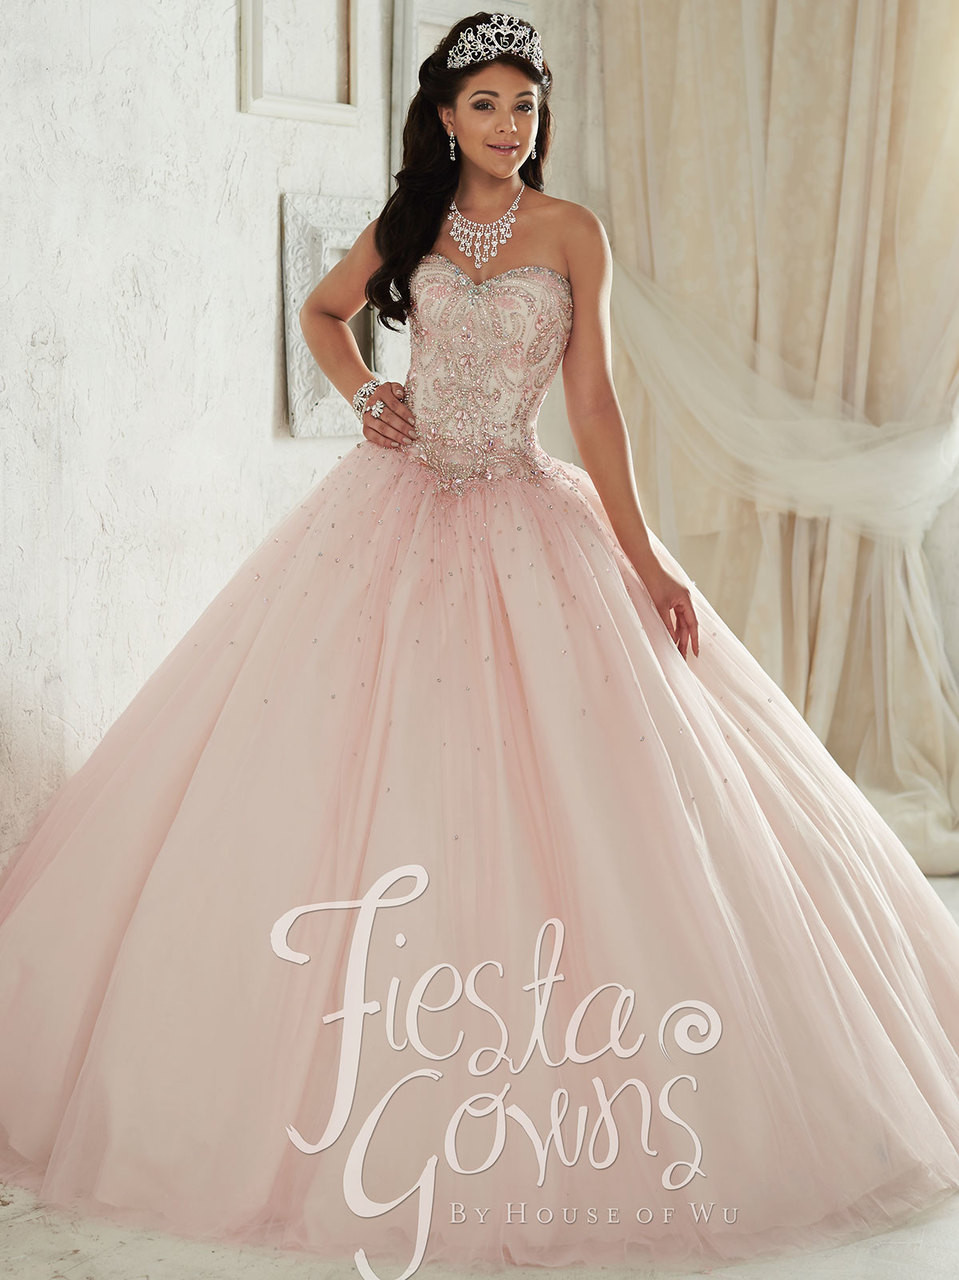 Tiffany Fiesta 56287 Beaded Bodice Quinceañera Ball Gown ...